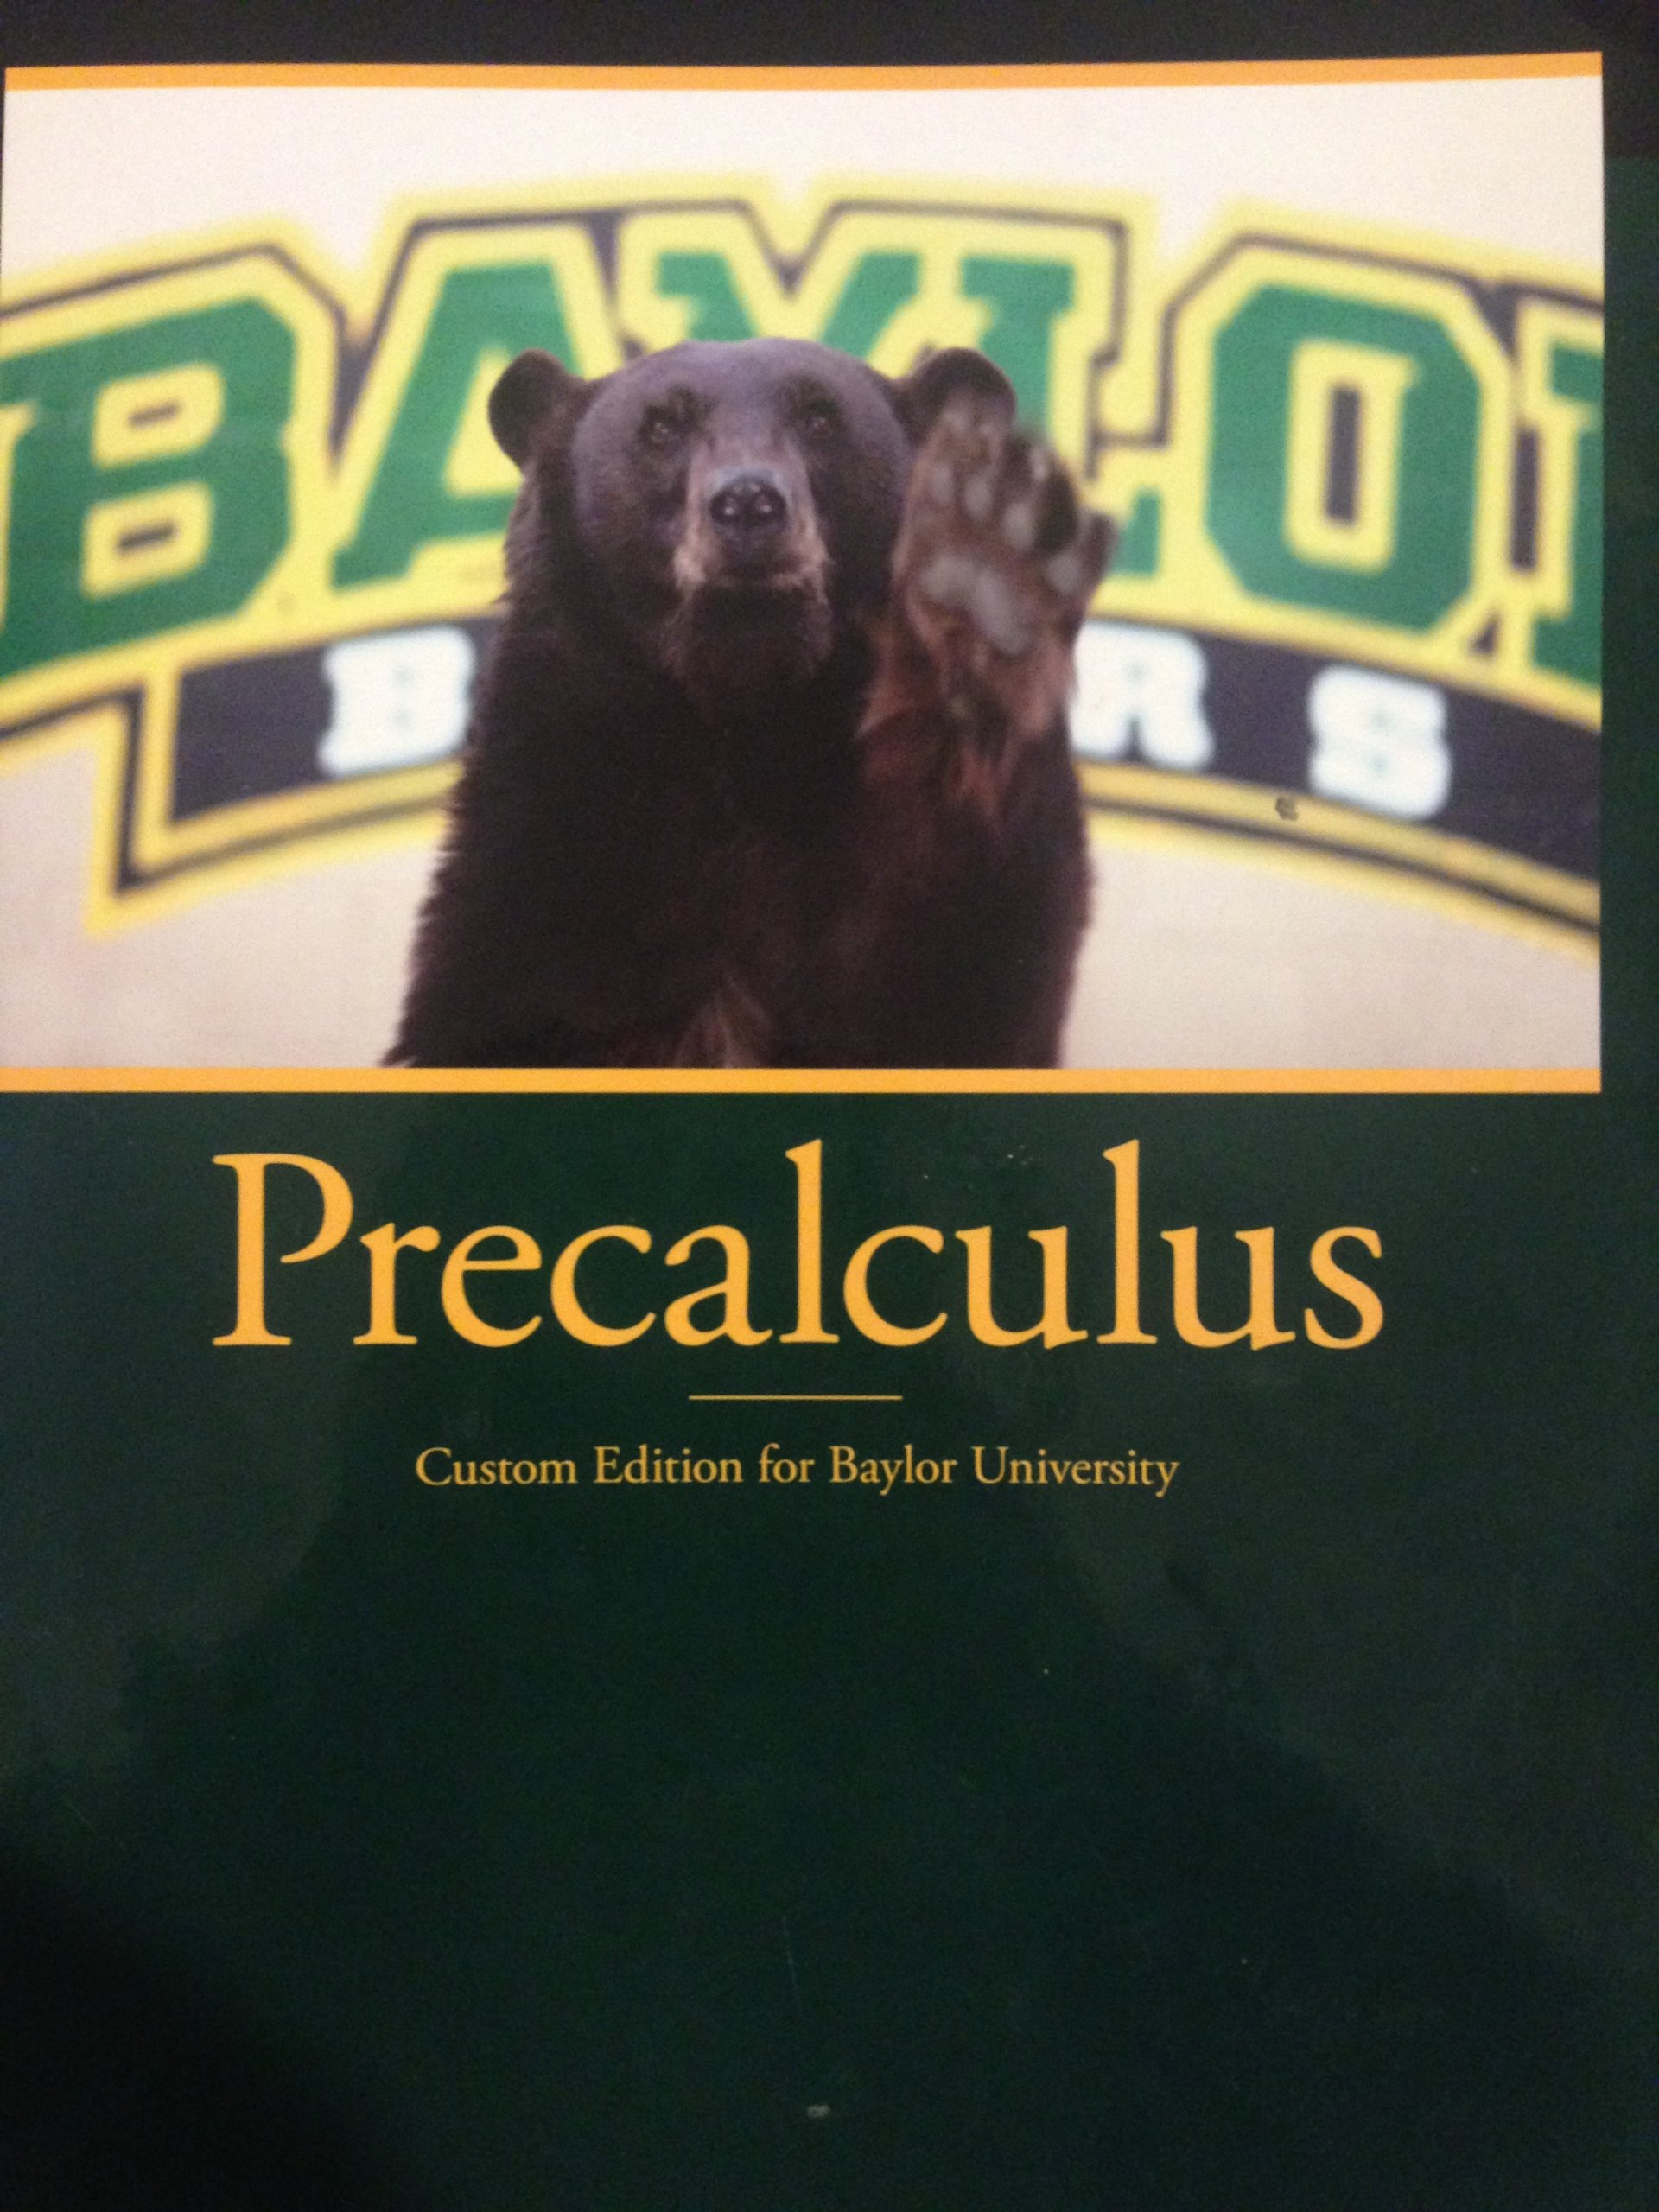 Precalculus custom edition for baylor university: robert blizter.